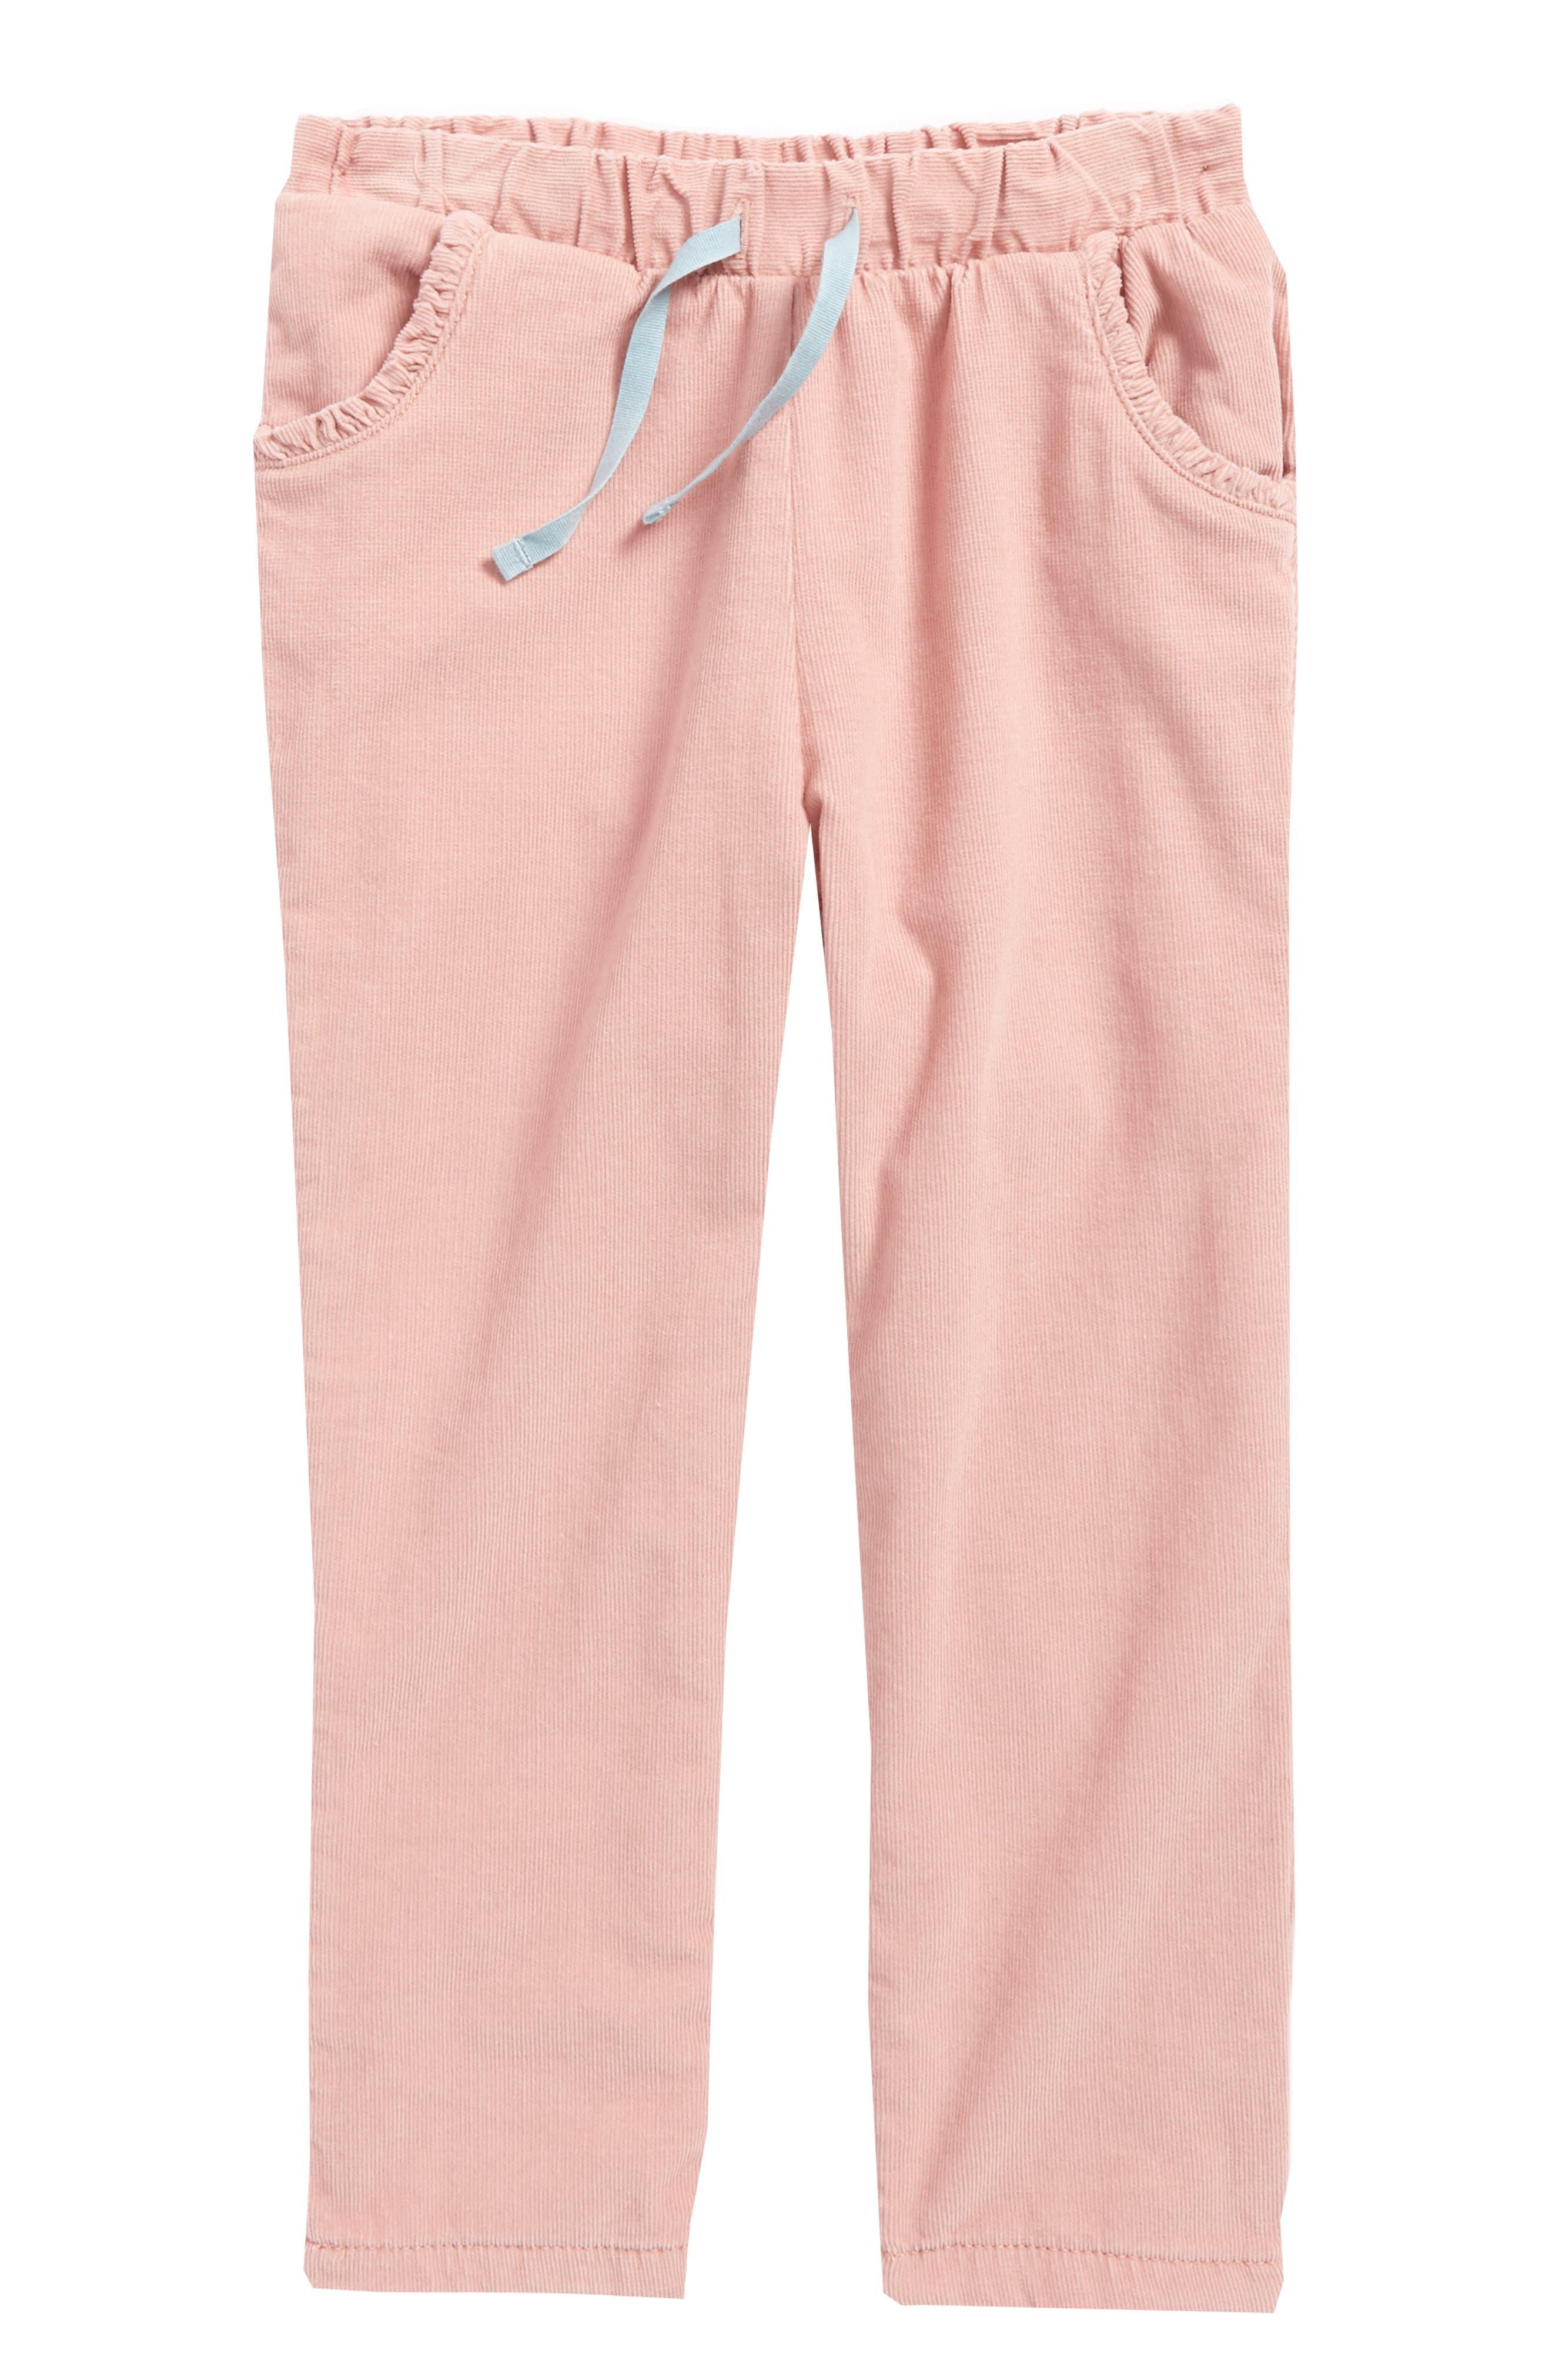 Alternate Image 1 Selected - Mini Boden Heart Pocket Corduroy Pants (Baby Girls & Toddler Girls)